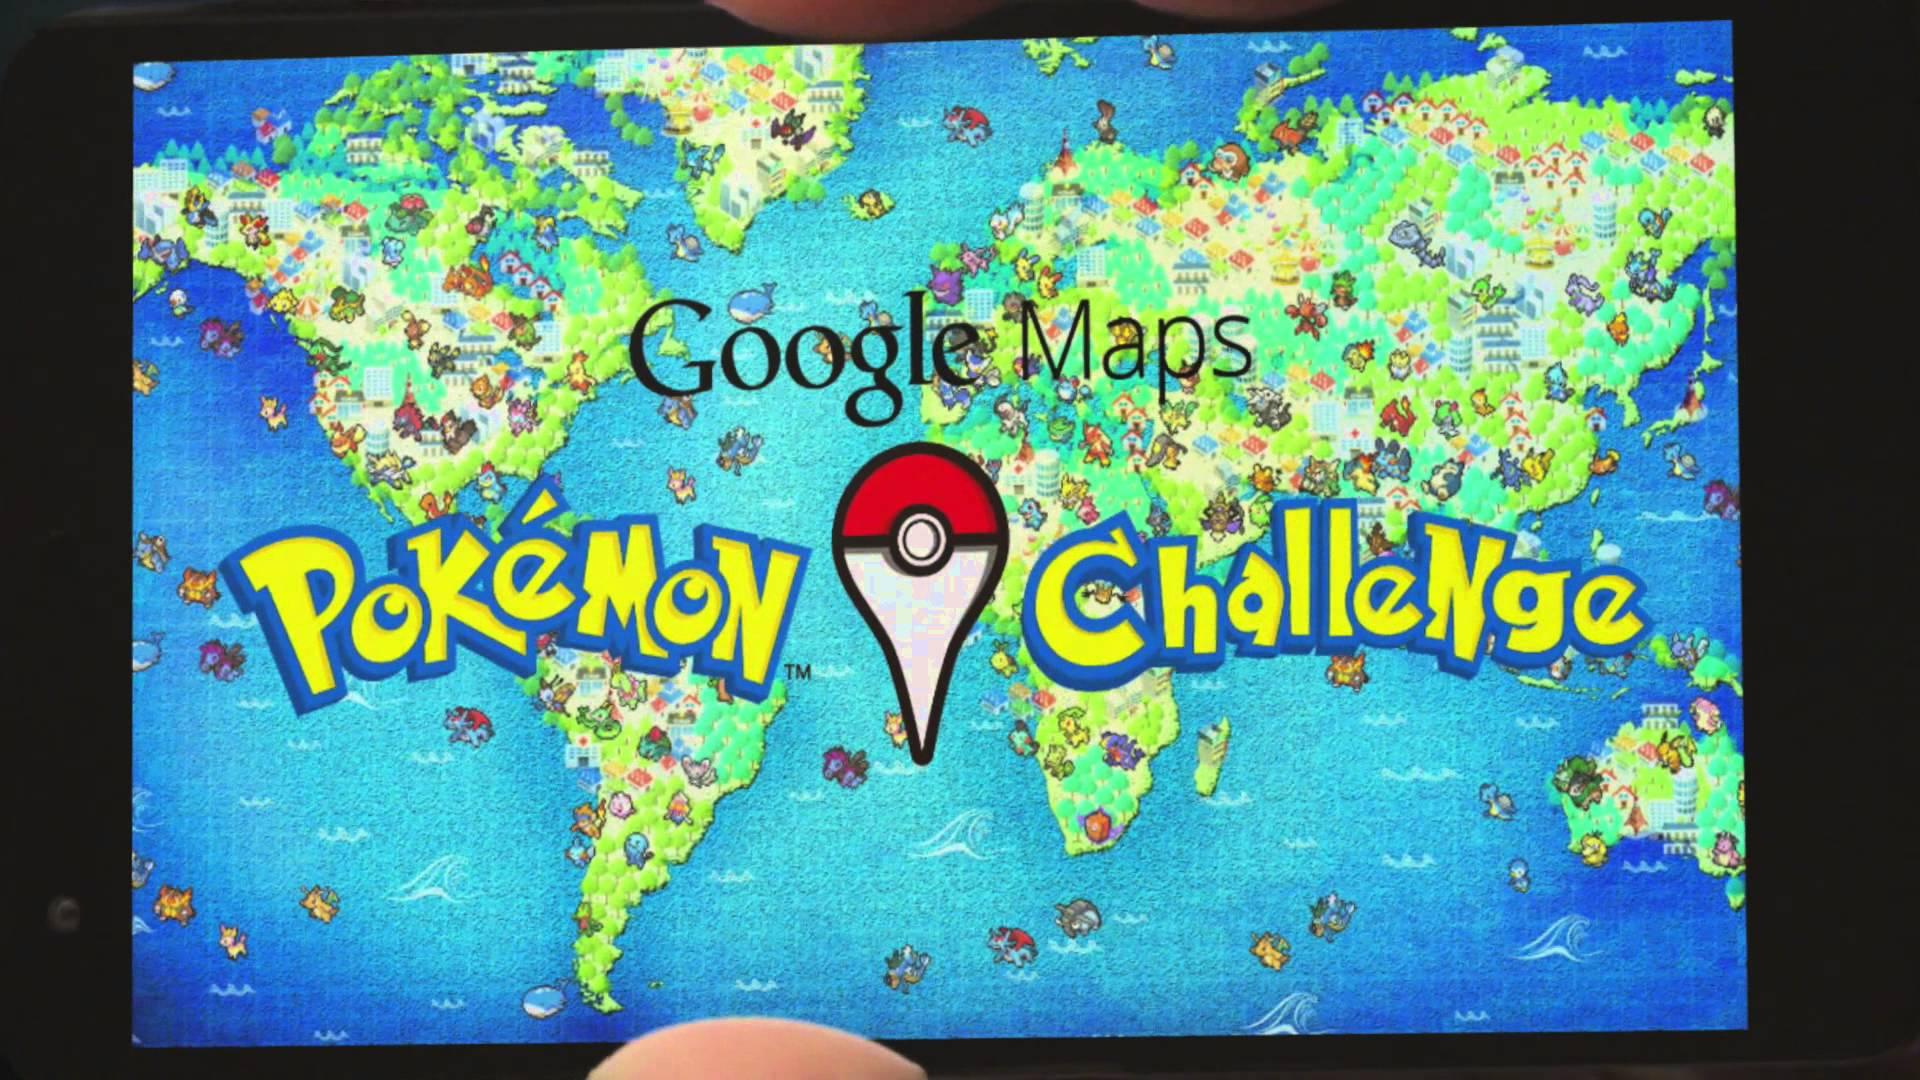 google-annonce-google-maps-pokemon-challenge-sur-android